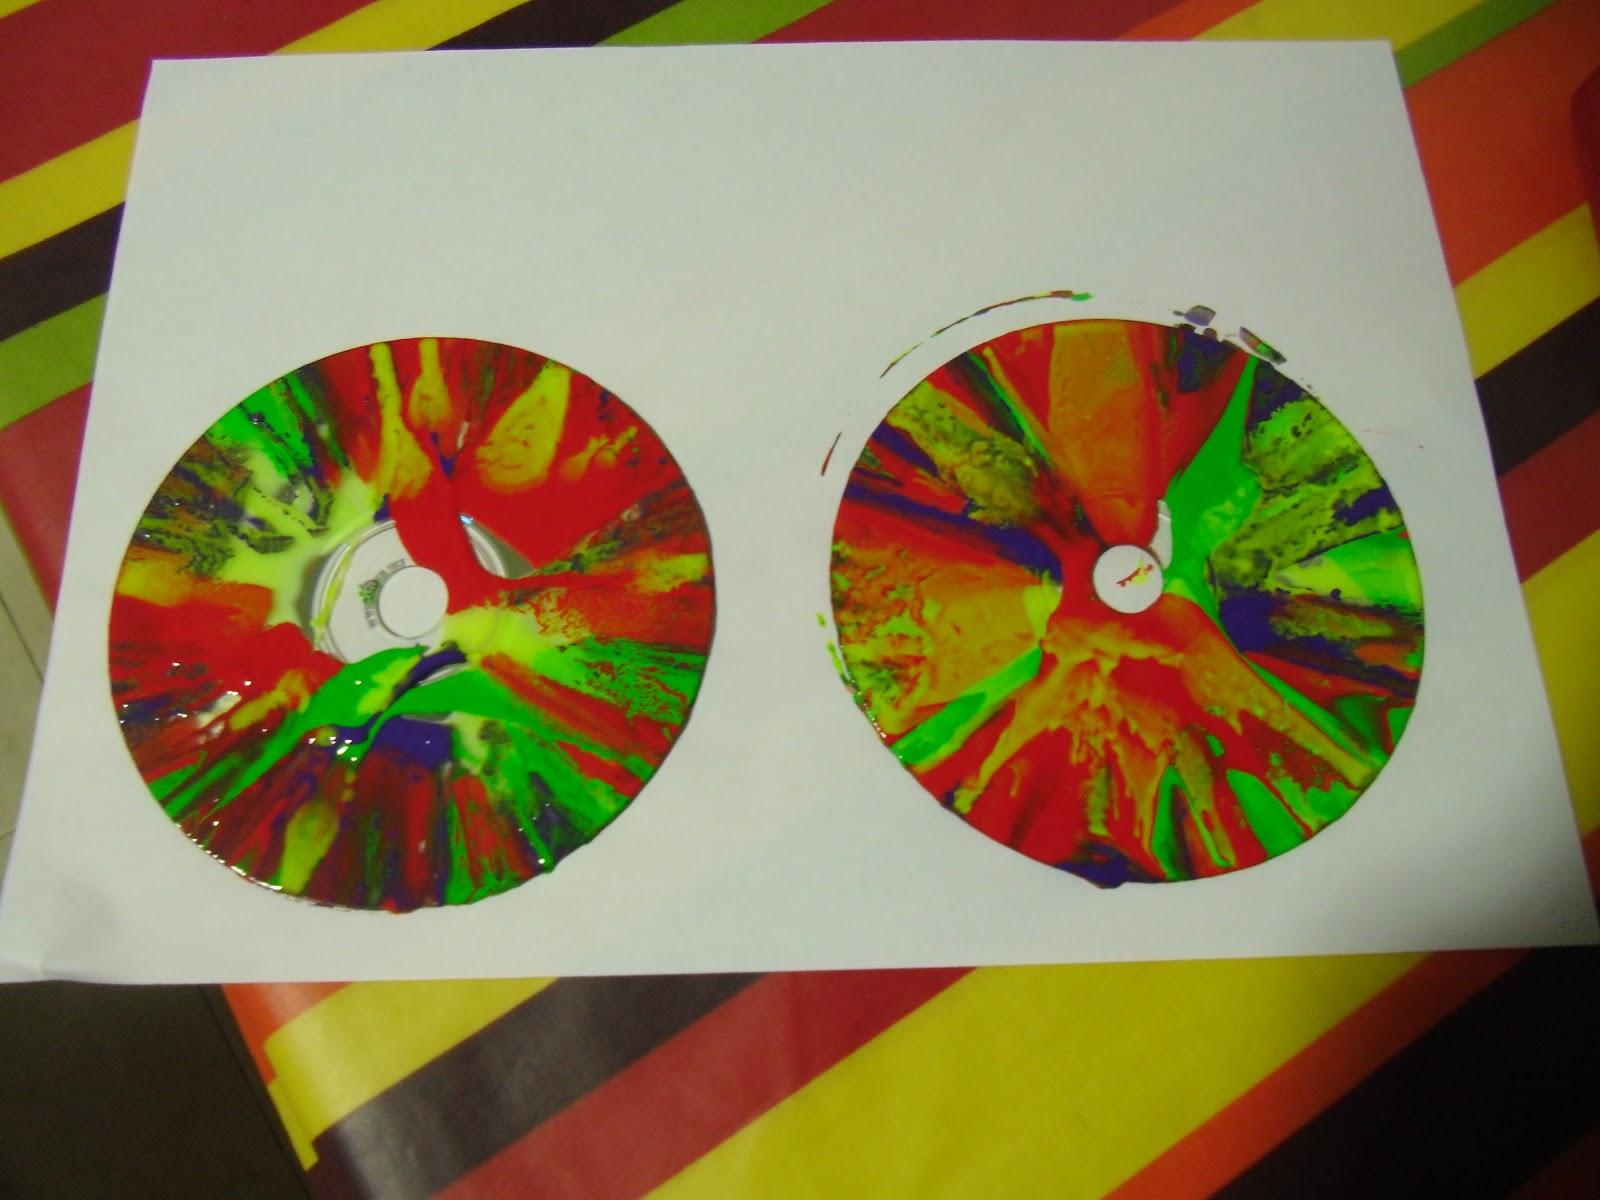 DECORAR CDS VIEJOS PARA HACER UN MÓVIL